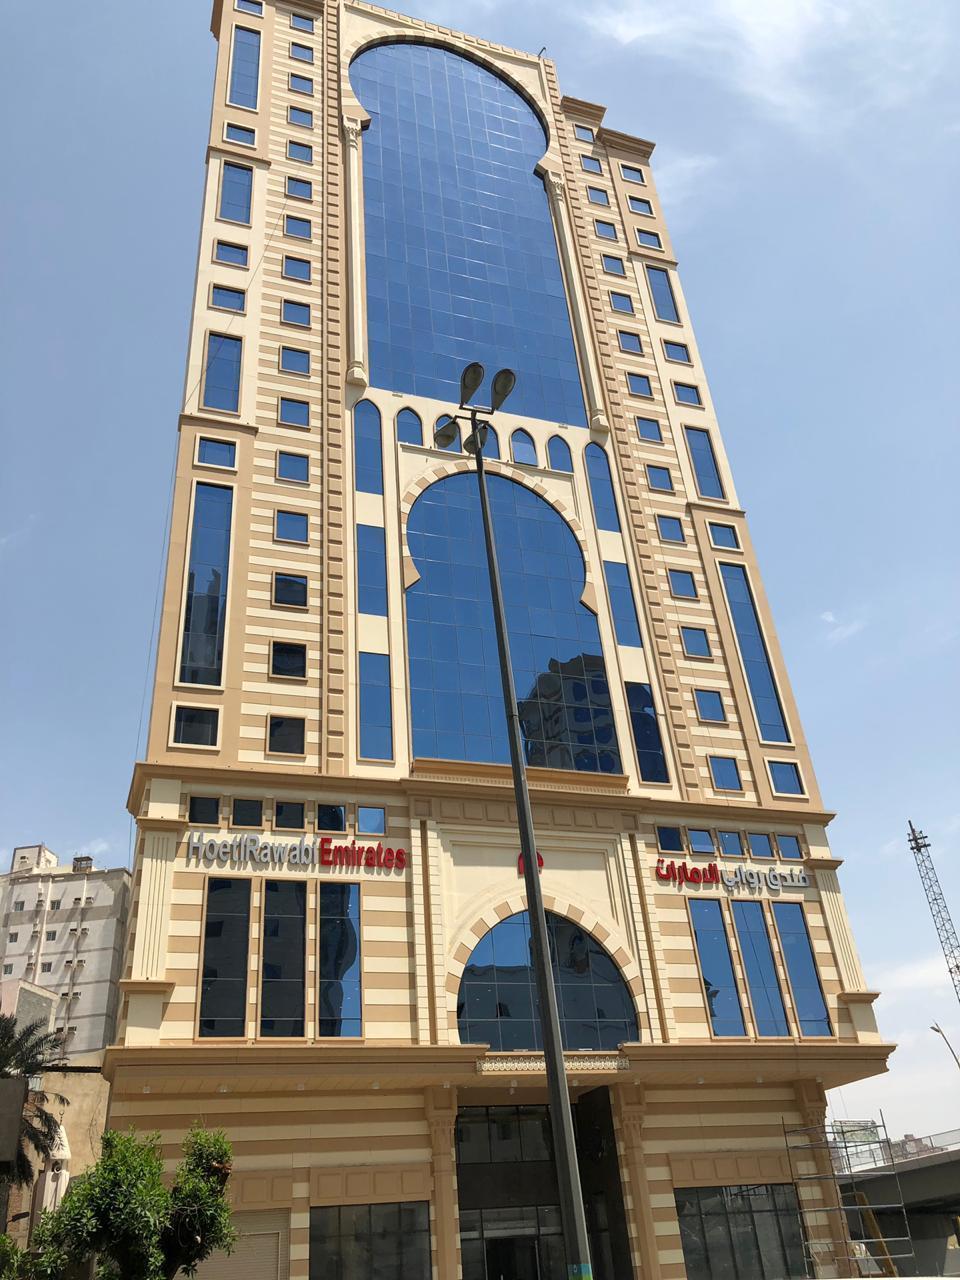 Rawabi Emirates